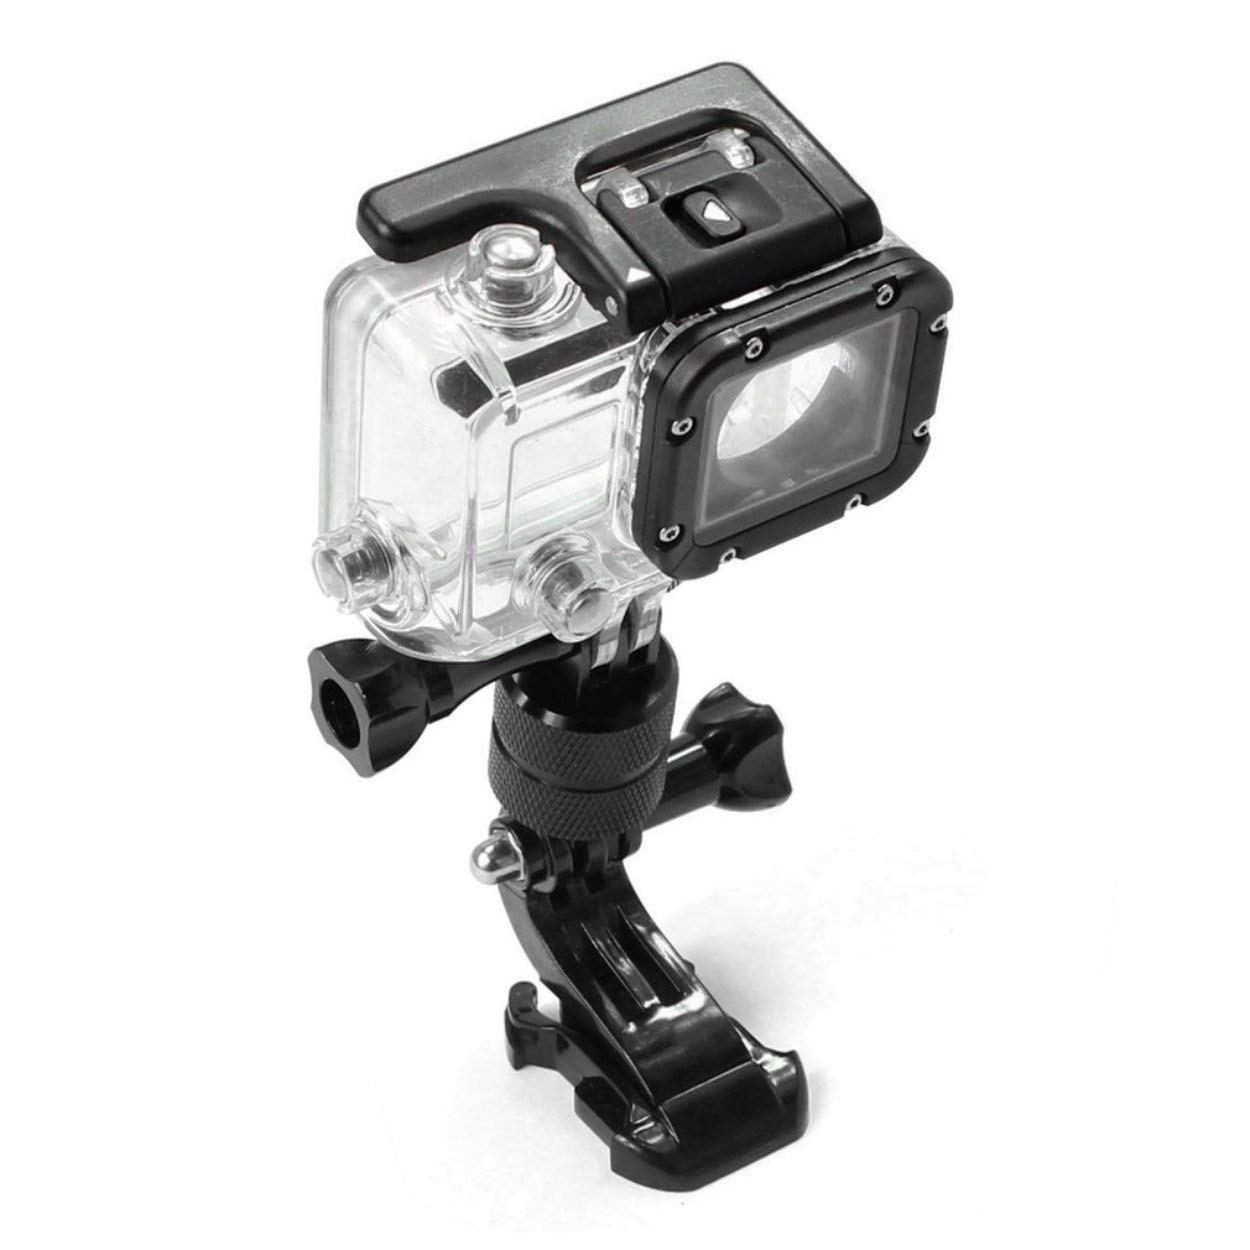 Flexible 360 Degree Rotating Swivel Arm Mount Adapter Pivot Arm for GoPro 5//4// 3 Aluminum Alloy Fixed Base Rotation Arm